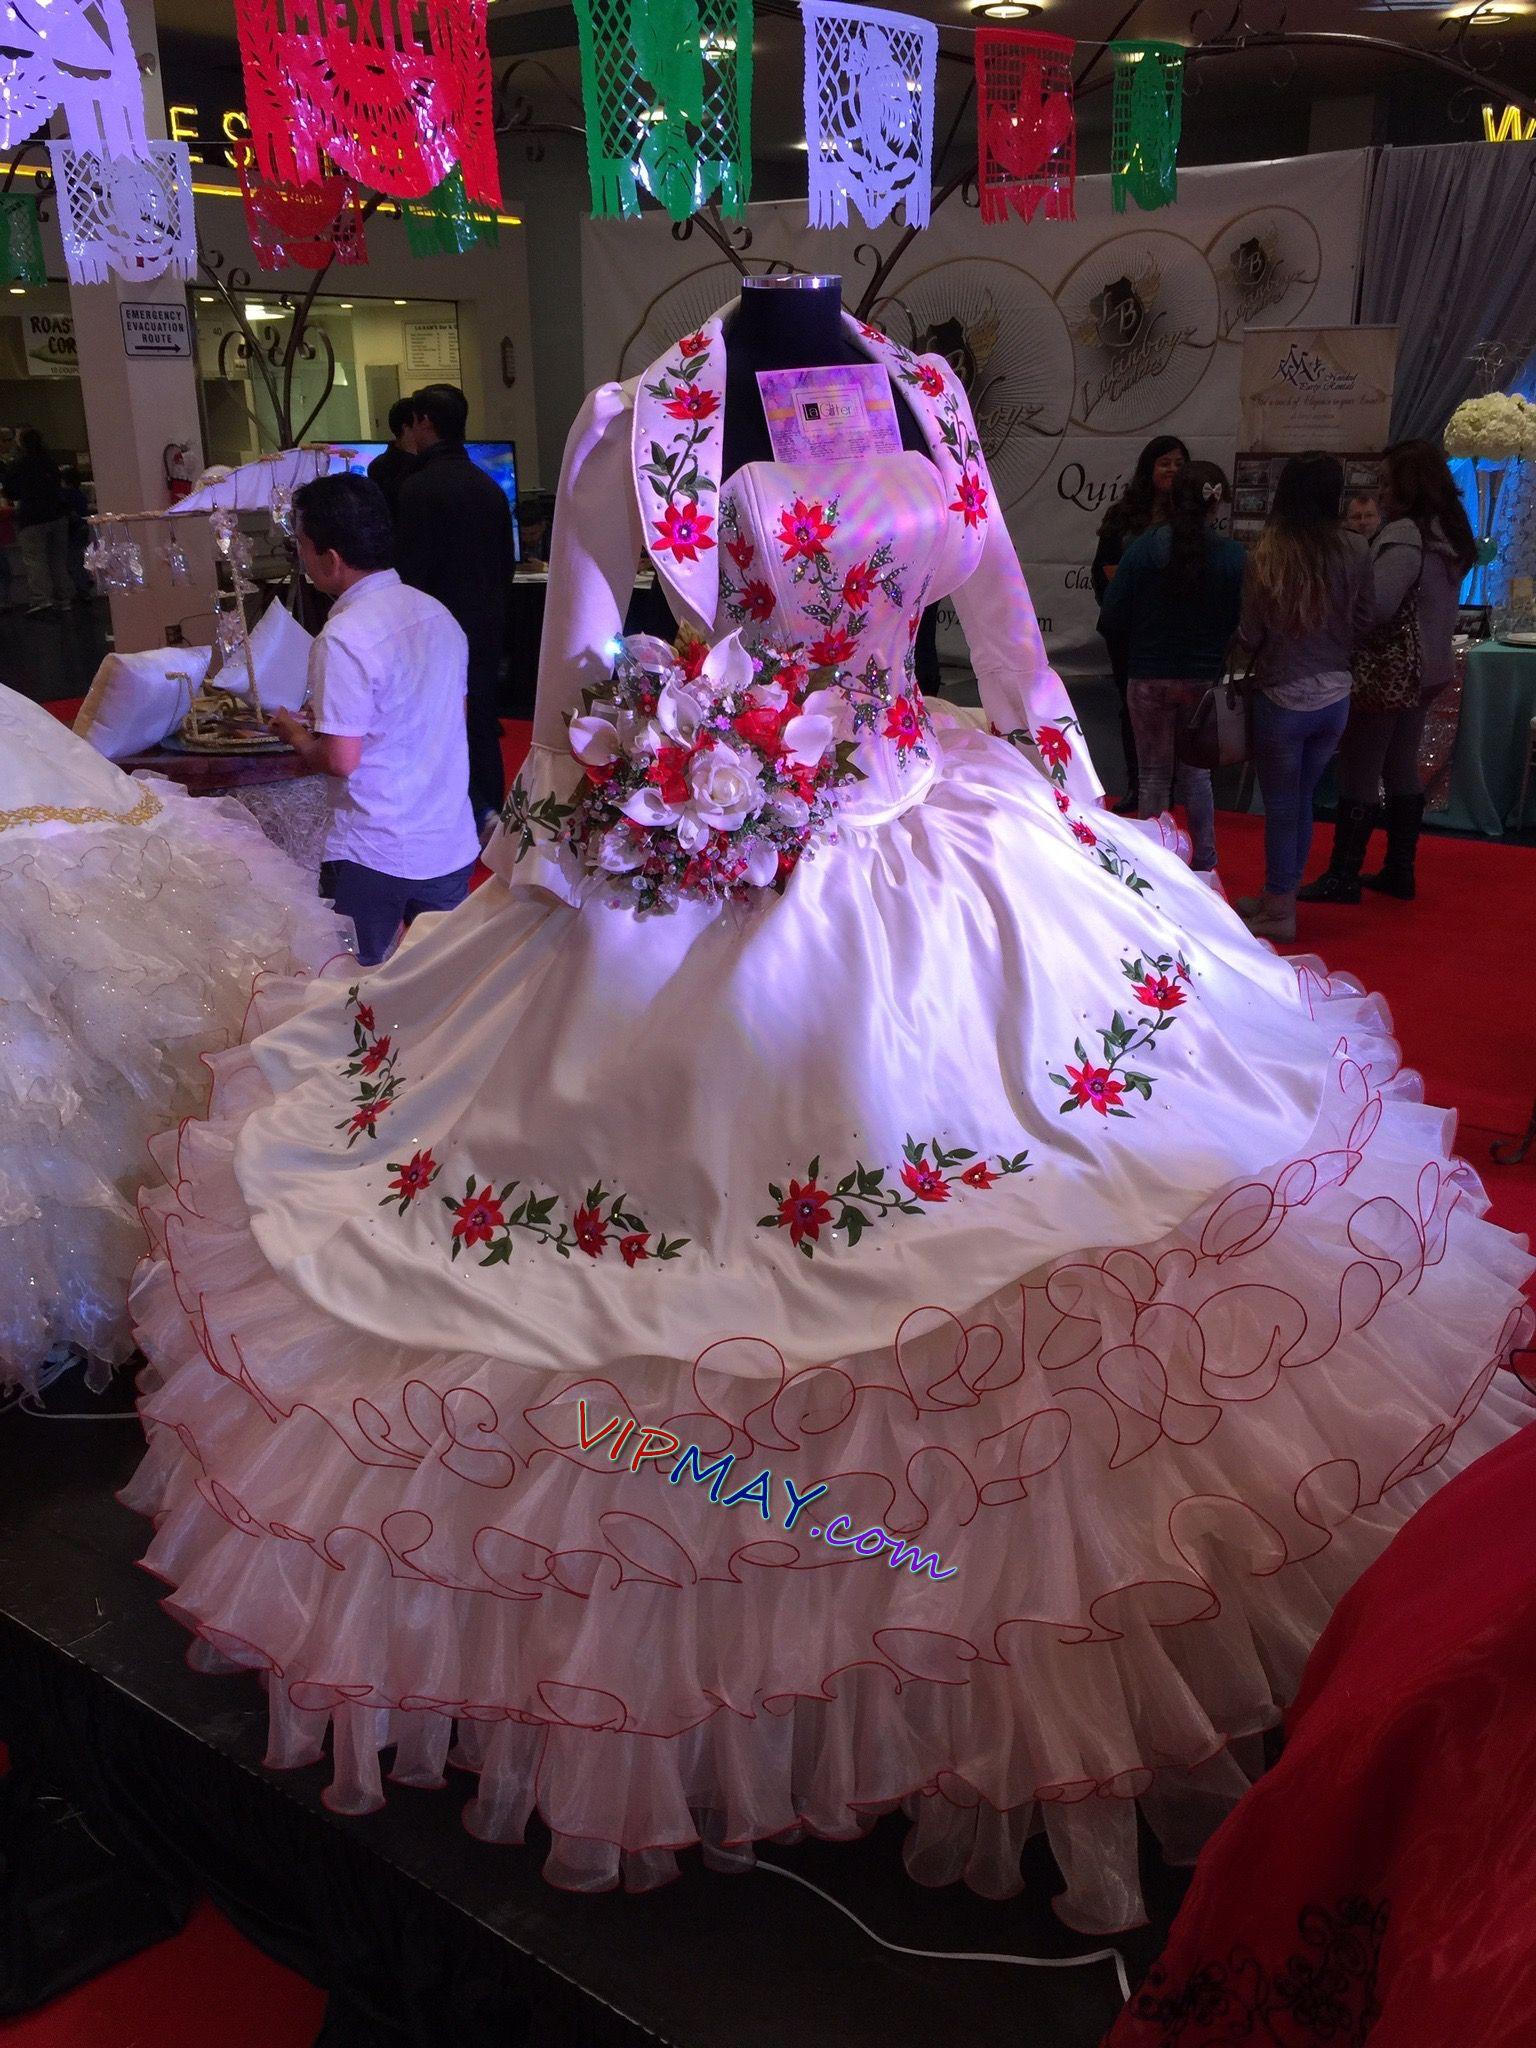 charro quinceanera dress for sale,ruffled charro quinceanera dress,white and red quinceanera dress,white quinceanera dress,quinceanera dress with long sleeves,bolero jacket quinceanera dress,quinceanera dress with jacket,floral embroidery quinceanera dress,